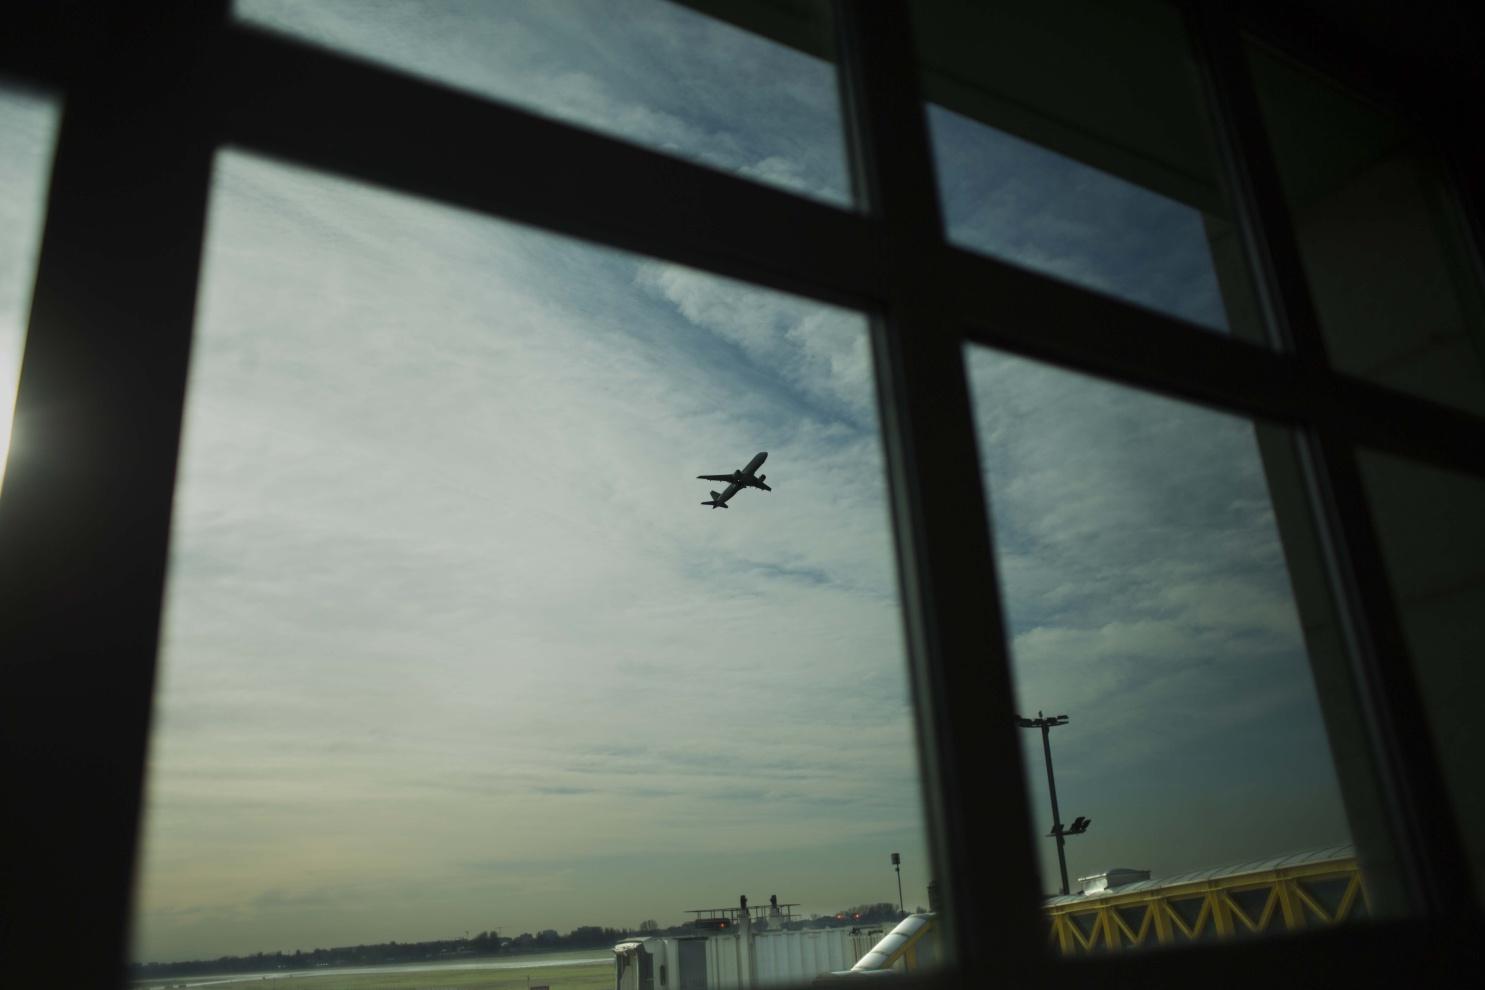 002 - Milano Linate Airport. January